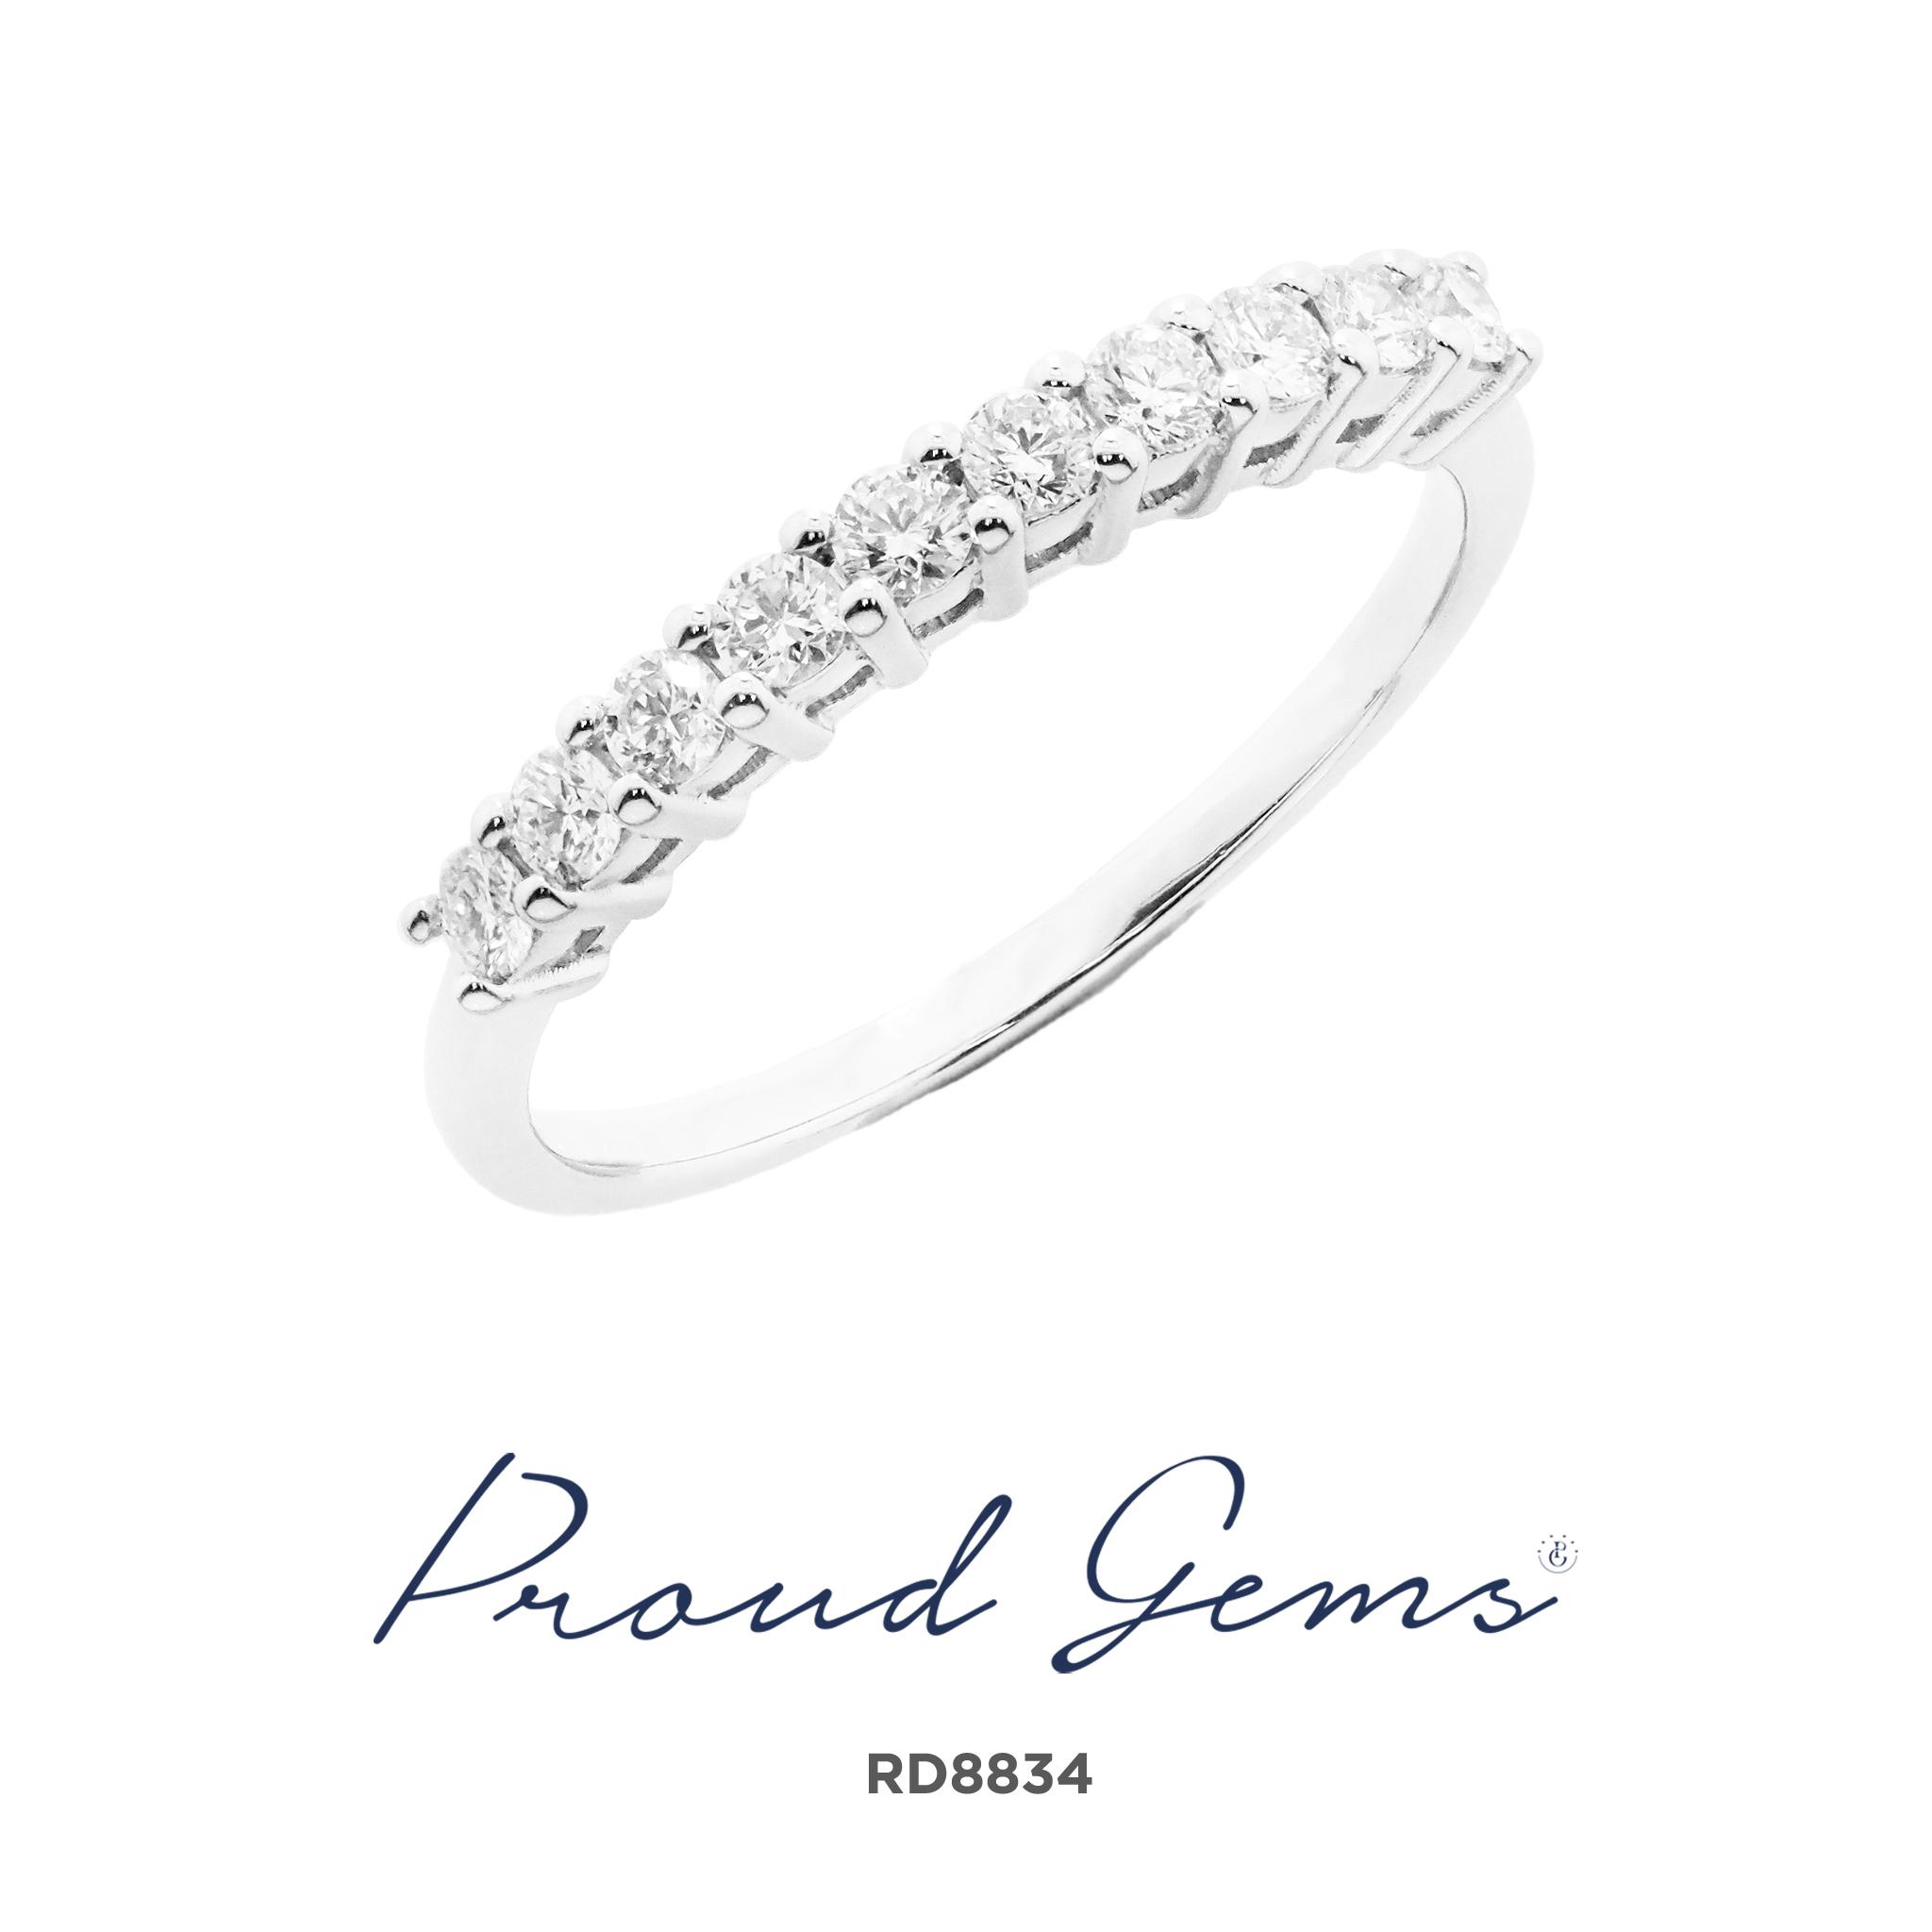 8834RD1 - แหวนเพชร  RD8850